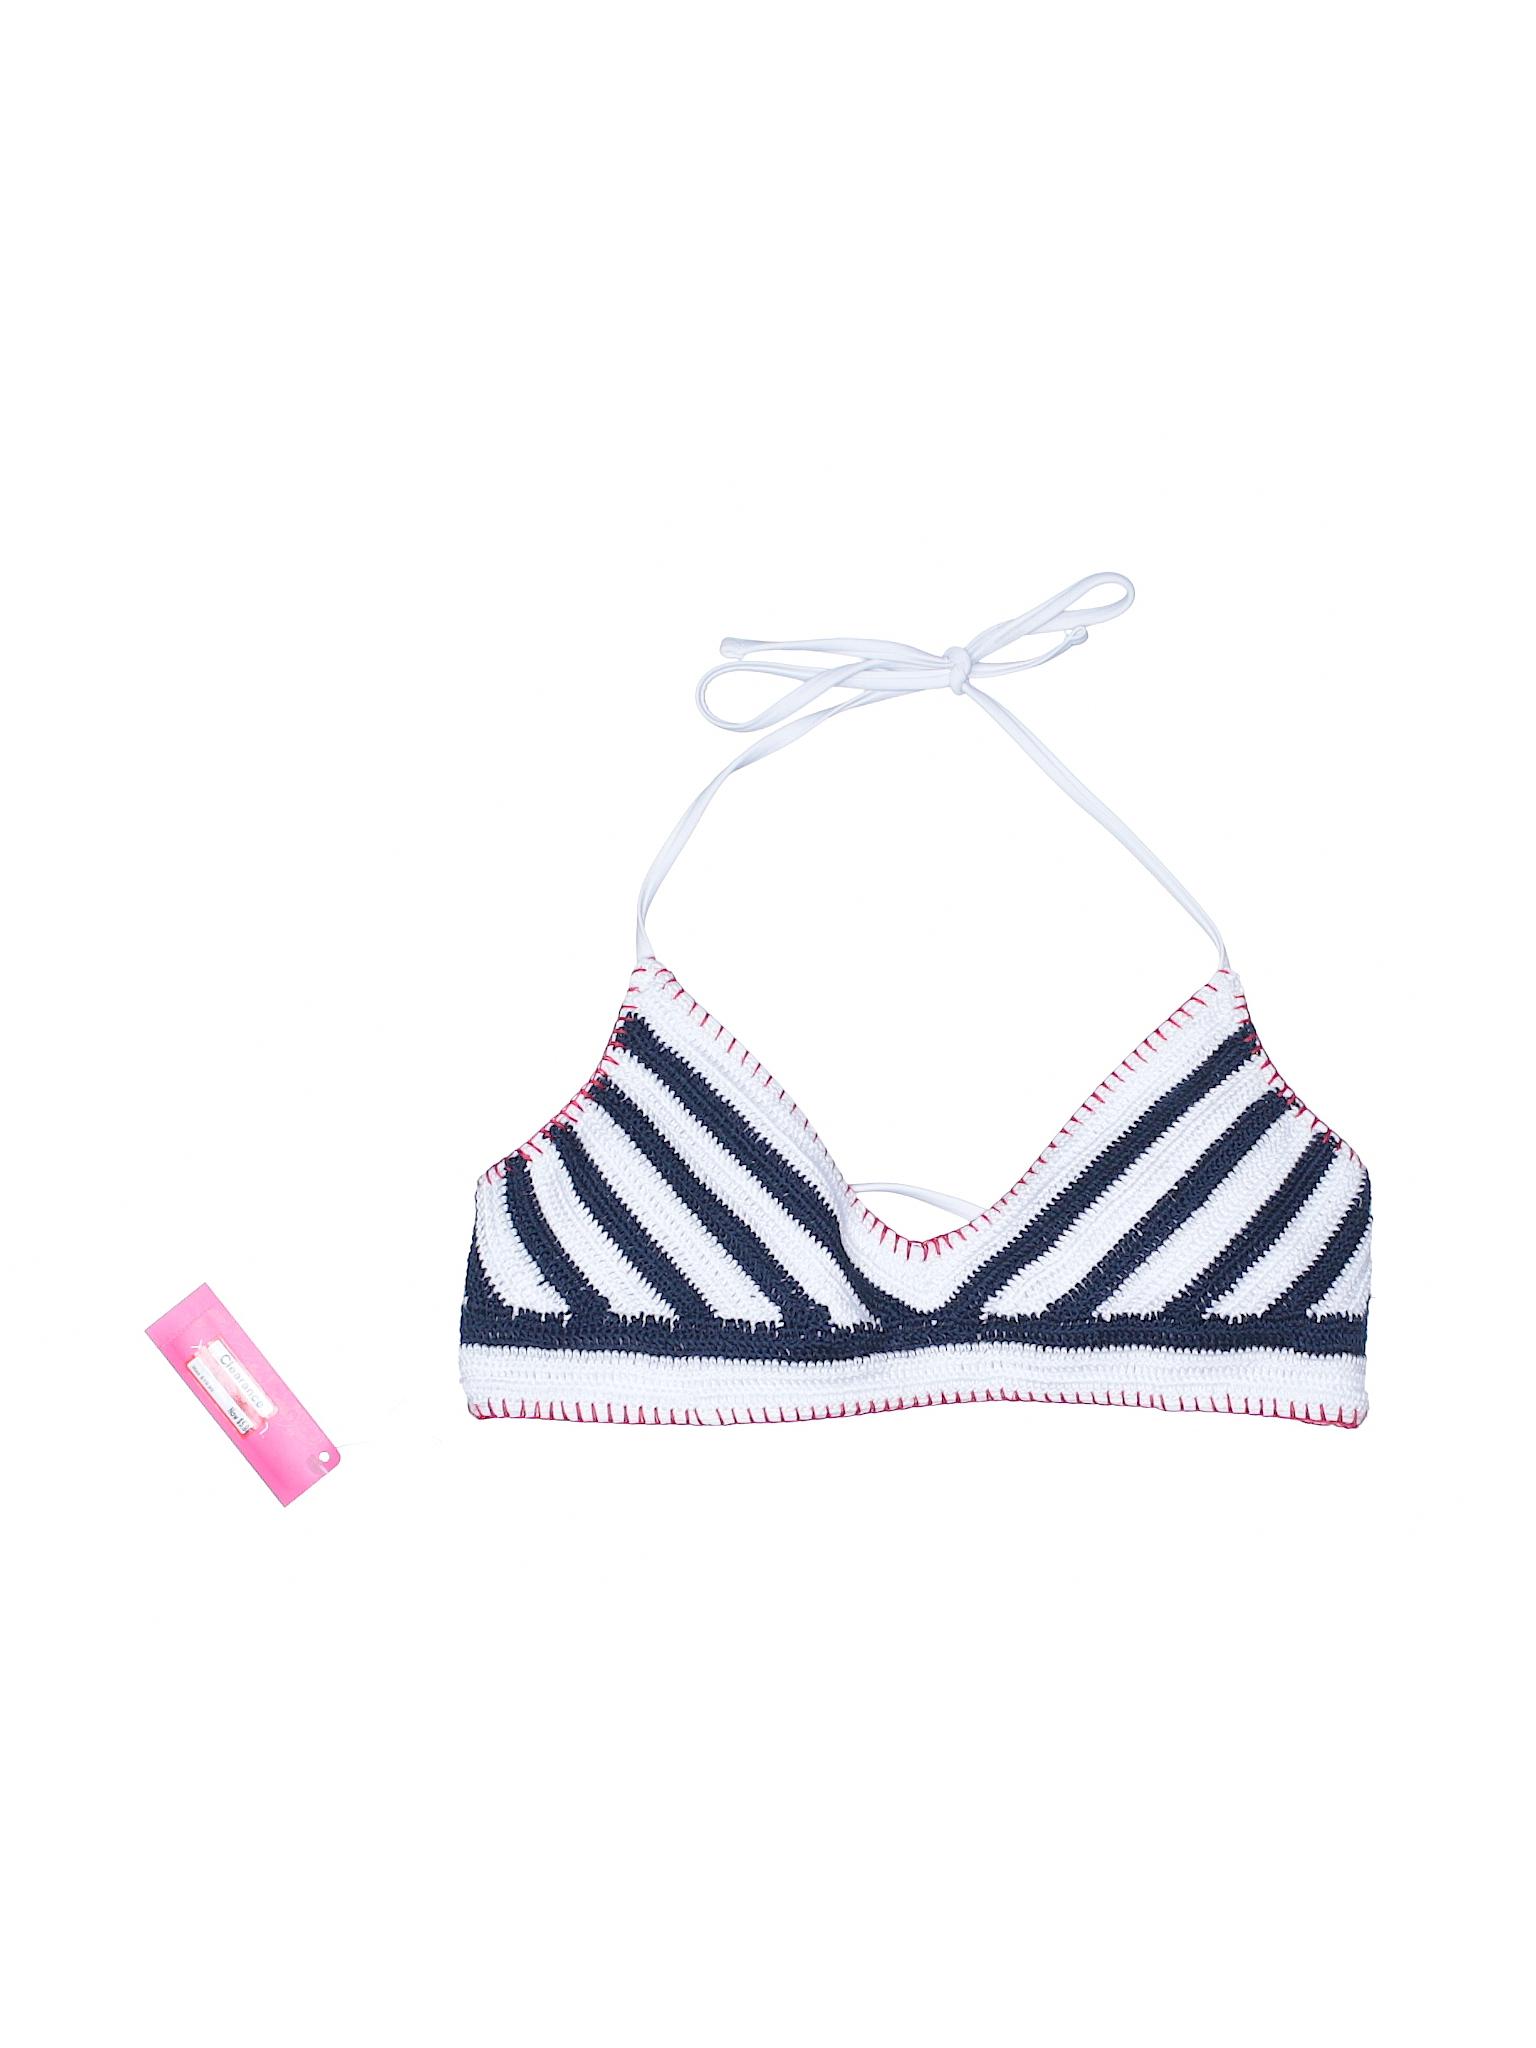 Boutique Top Swimsuit Boutique Xhilaration Swimsuit Xhilaration wRqxBv0T4